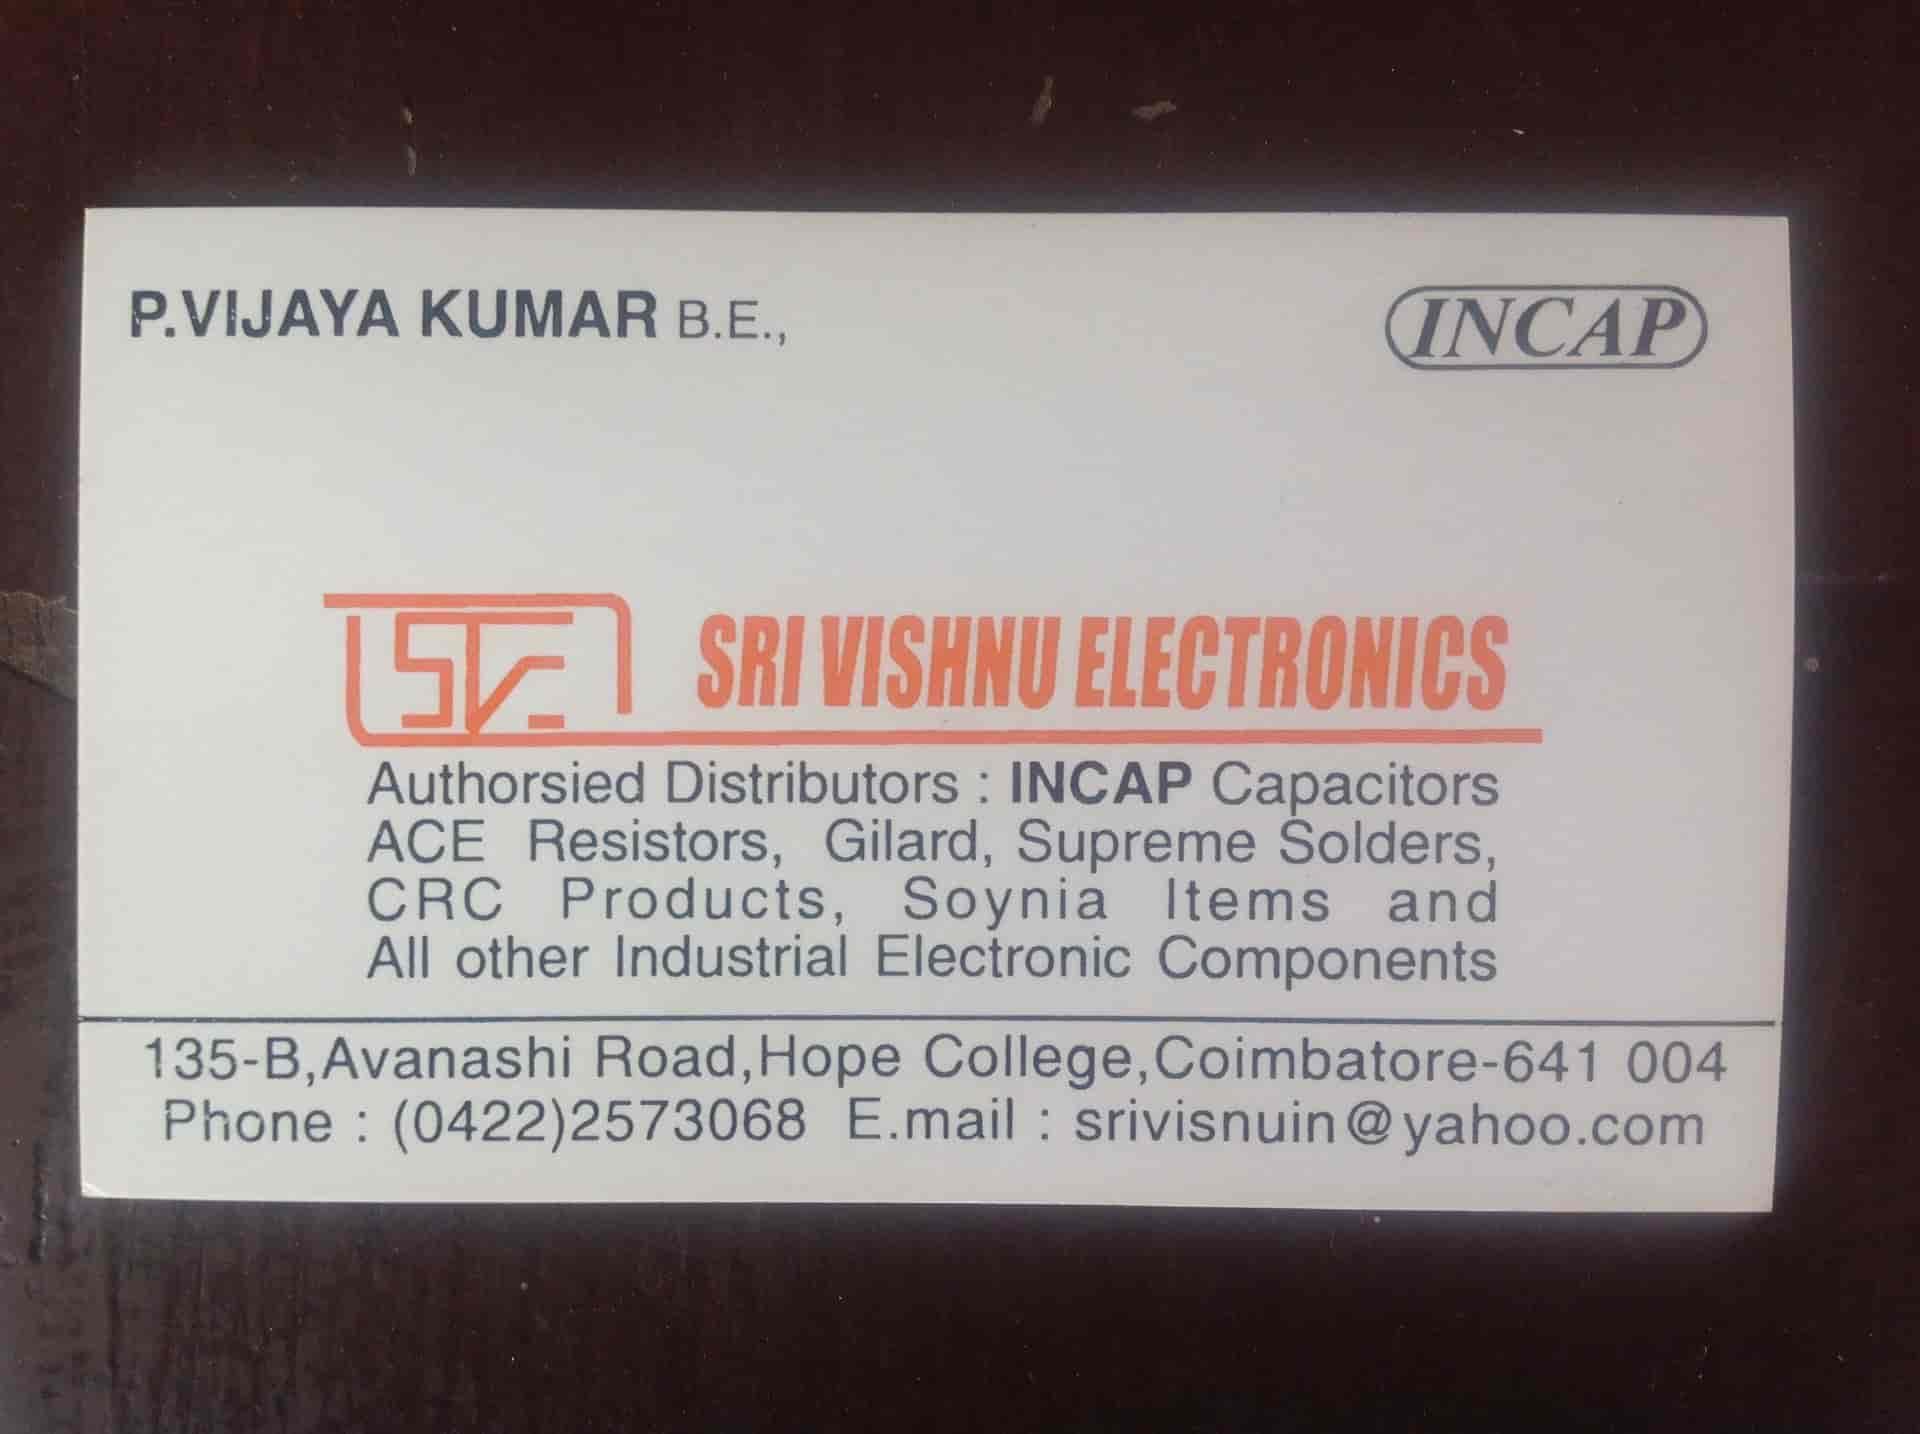 Mahalakshmi Electronics, Hopes - Electrical Shops in